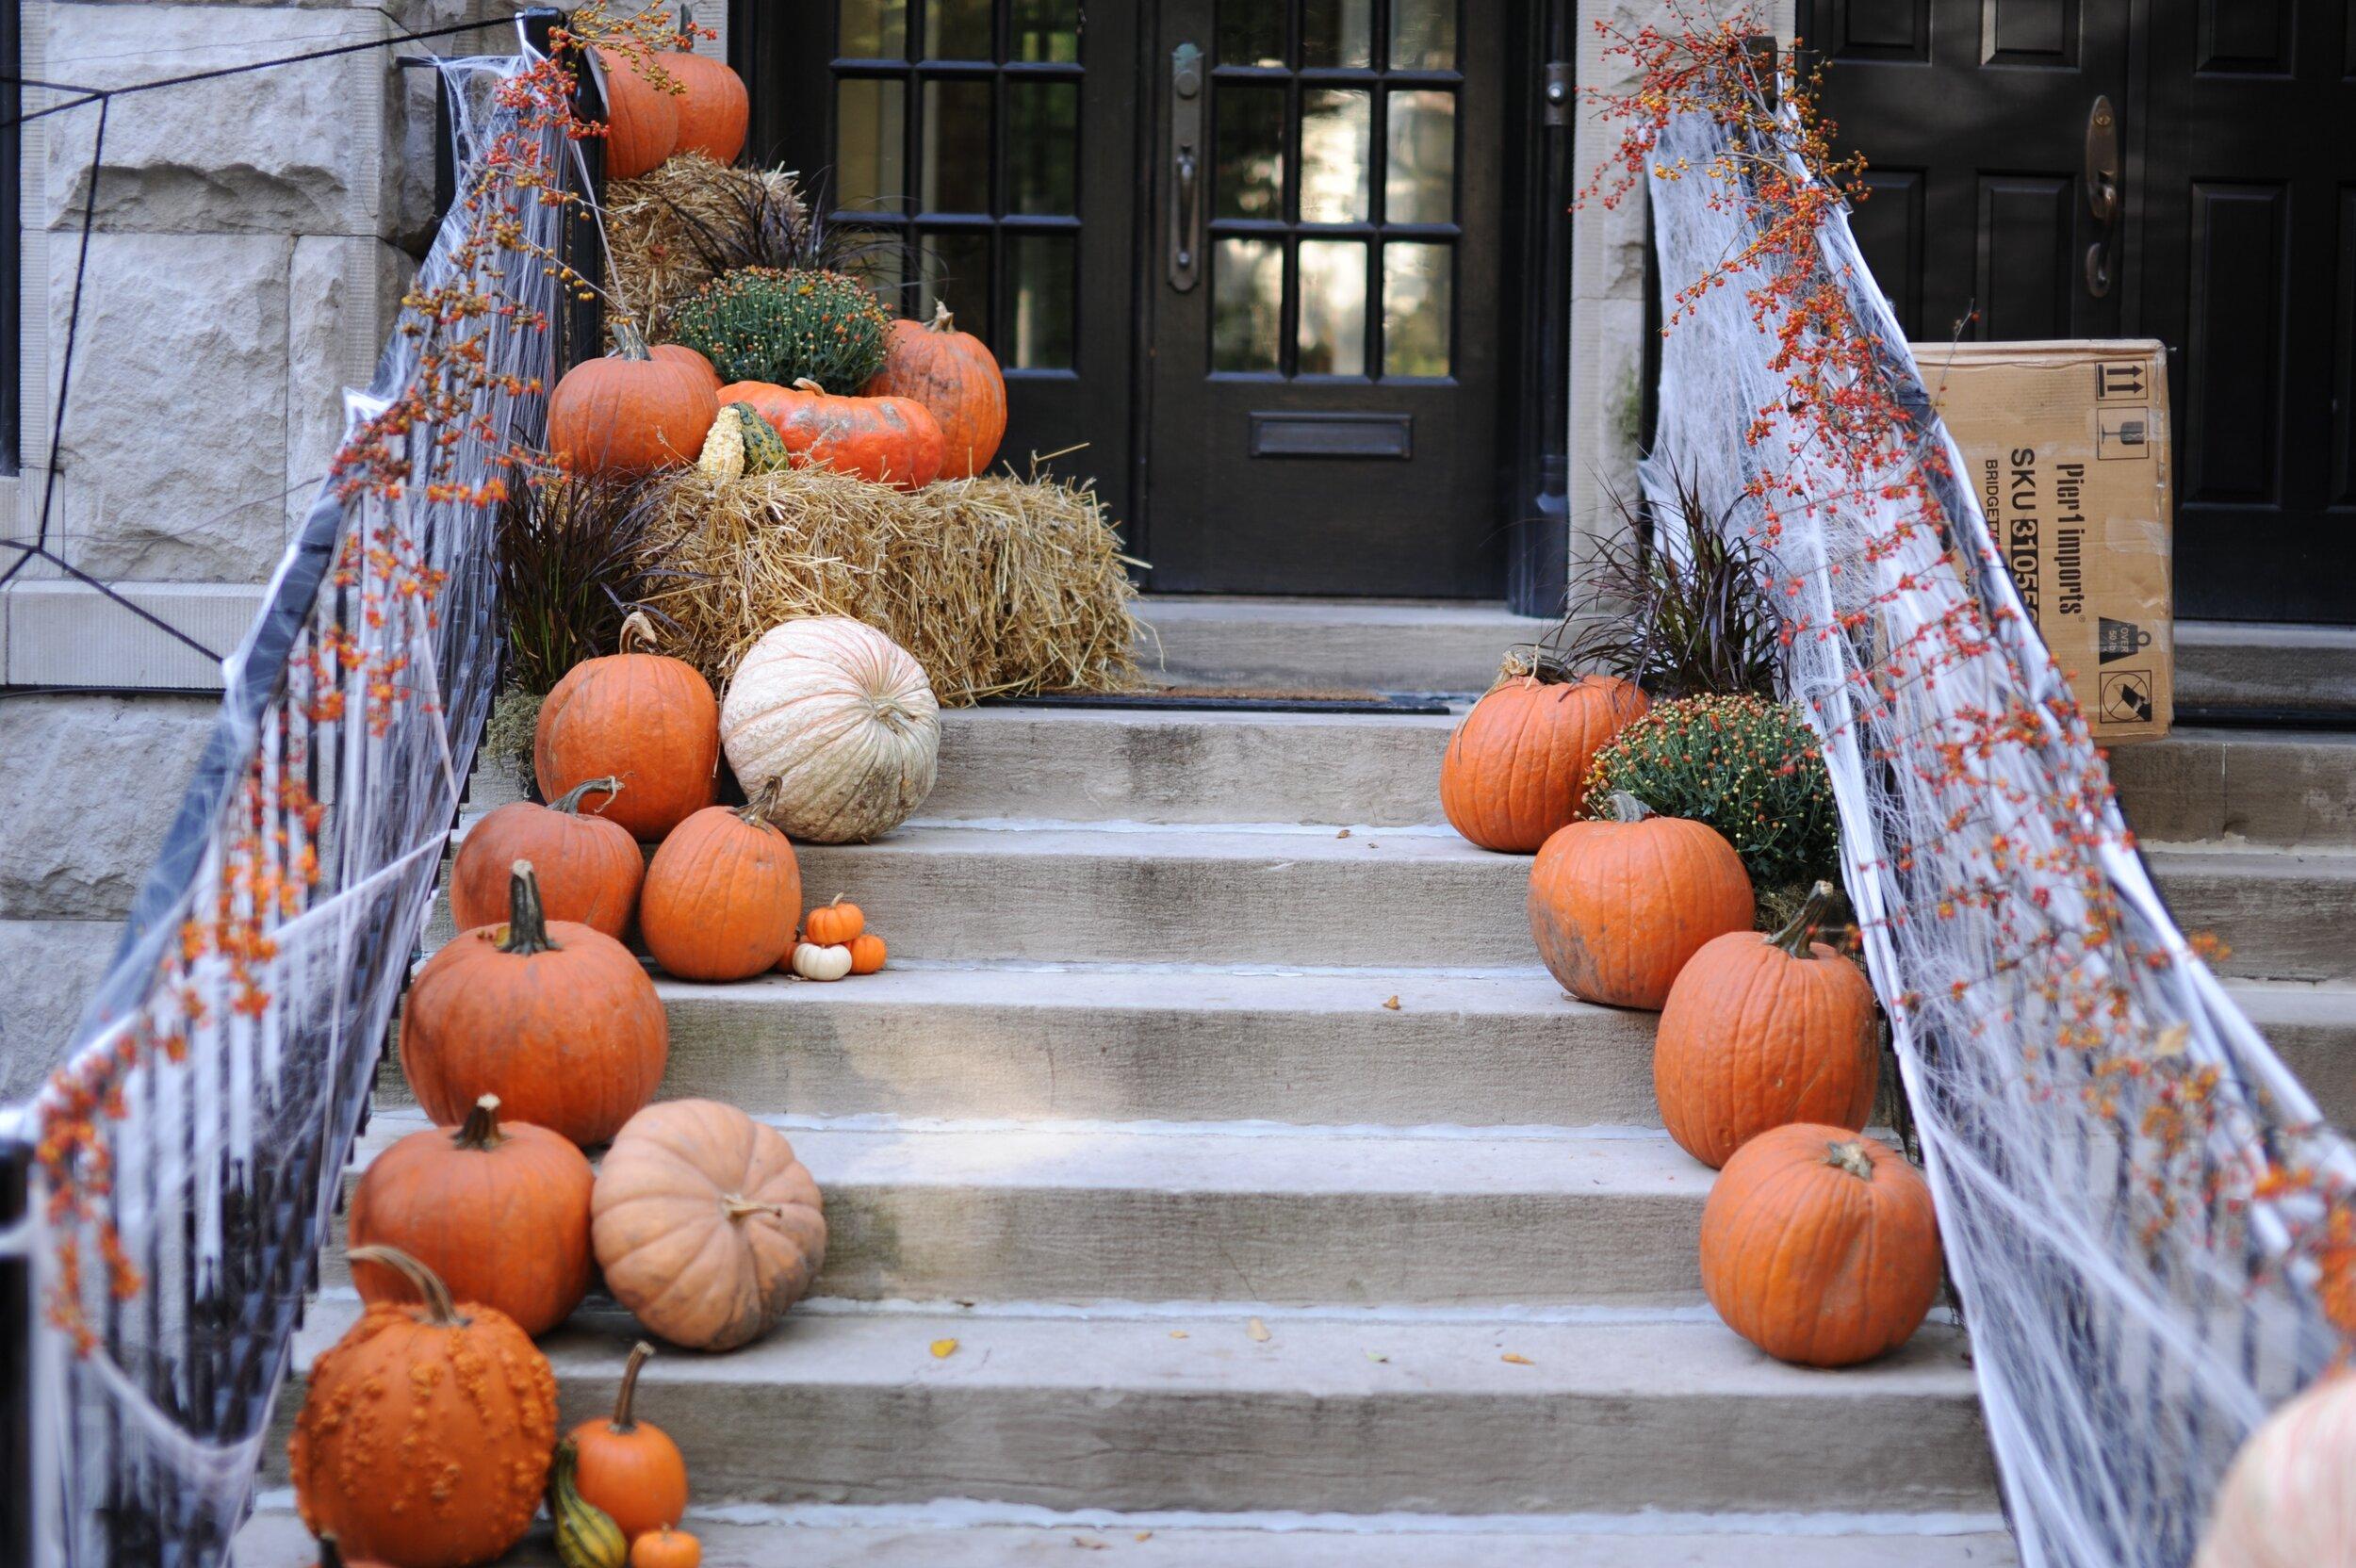 https://www.pexels.com/photo/pumpkin-display-1486689/